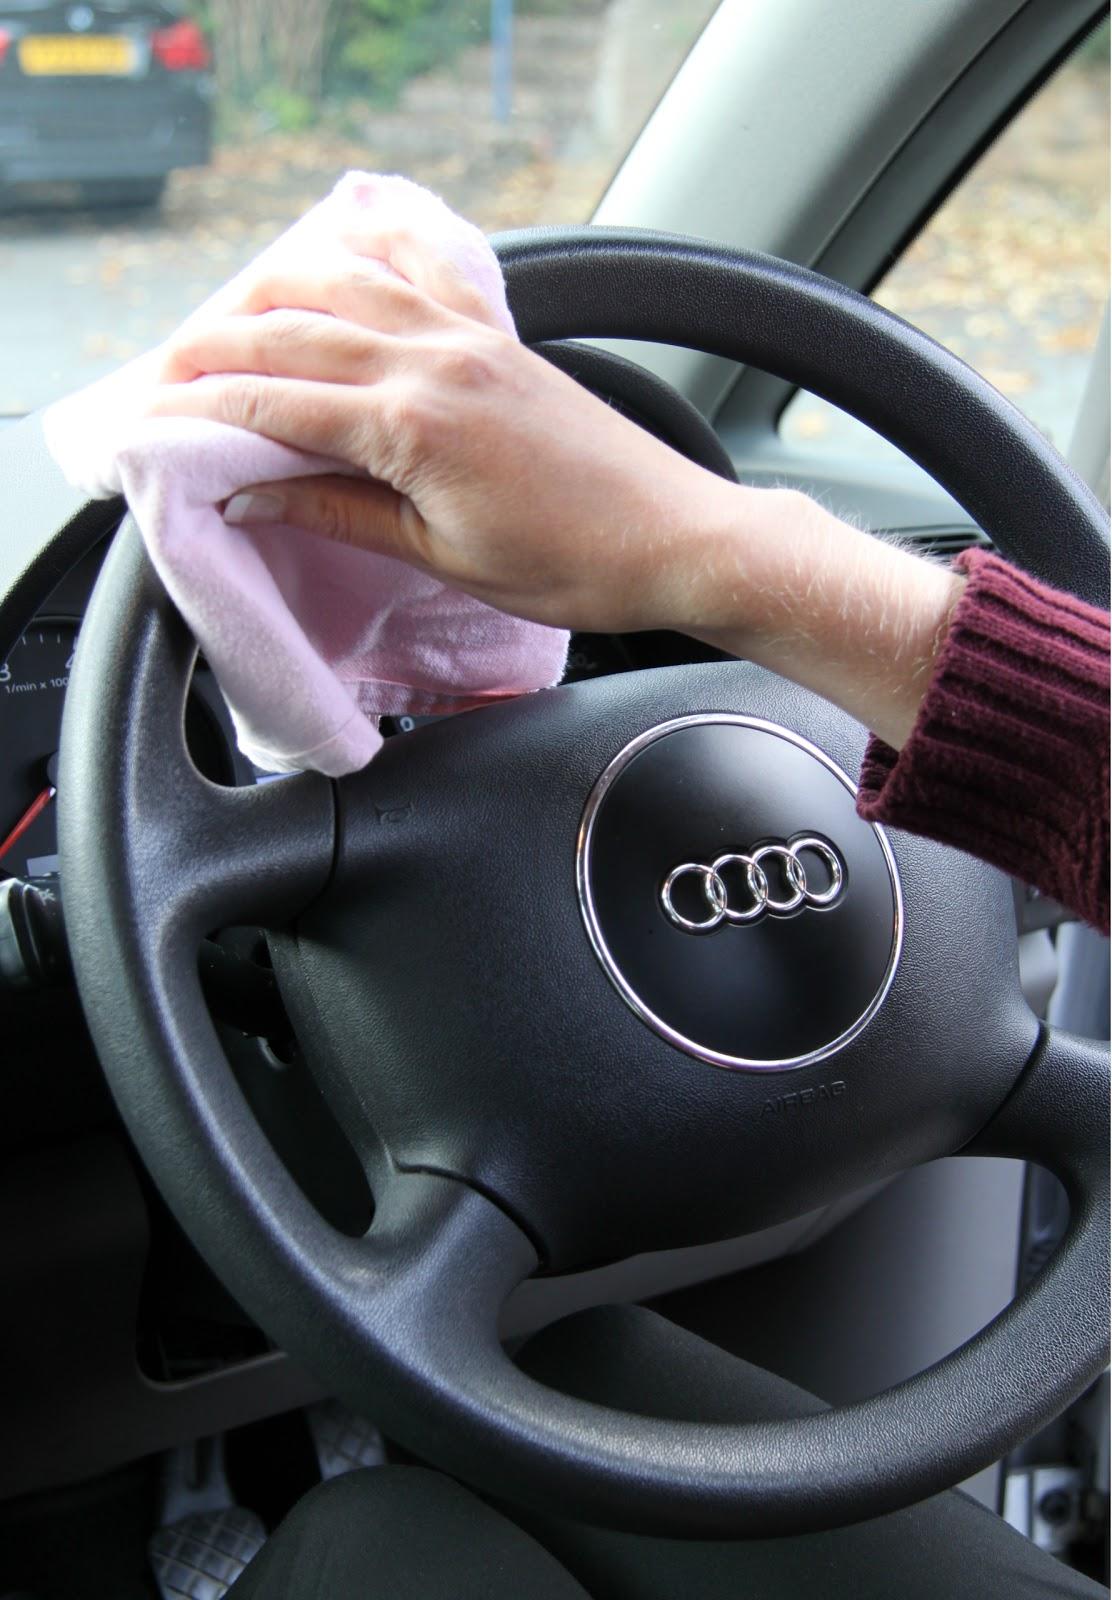 Dri pak blog keep your car interior clean and fresh - How to keep your car exterior clean ...